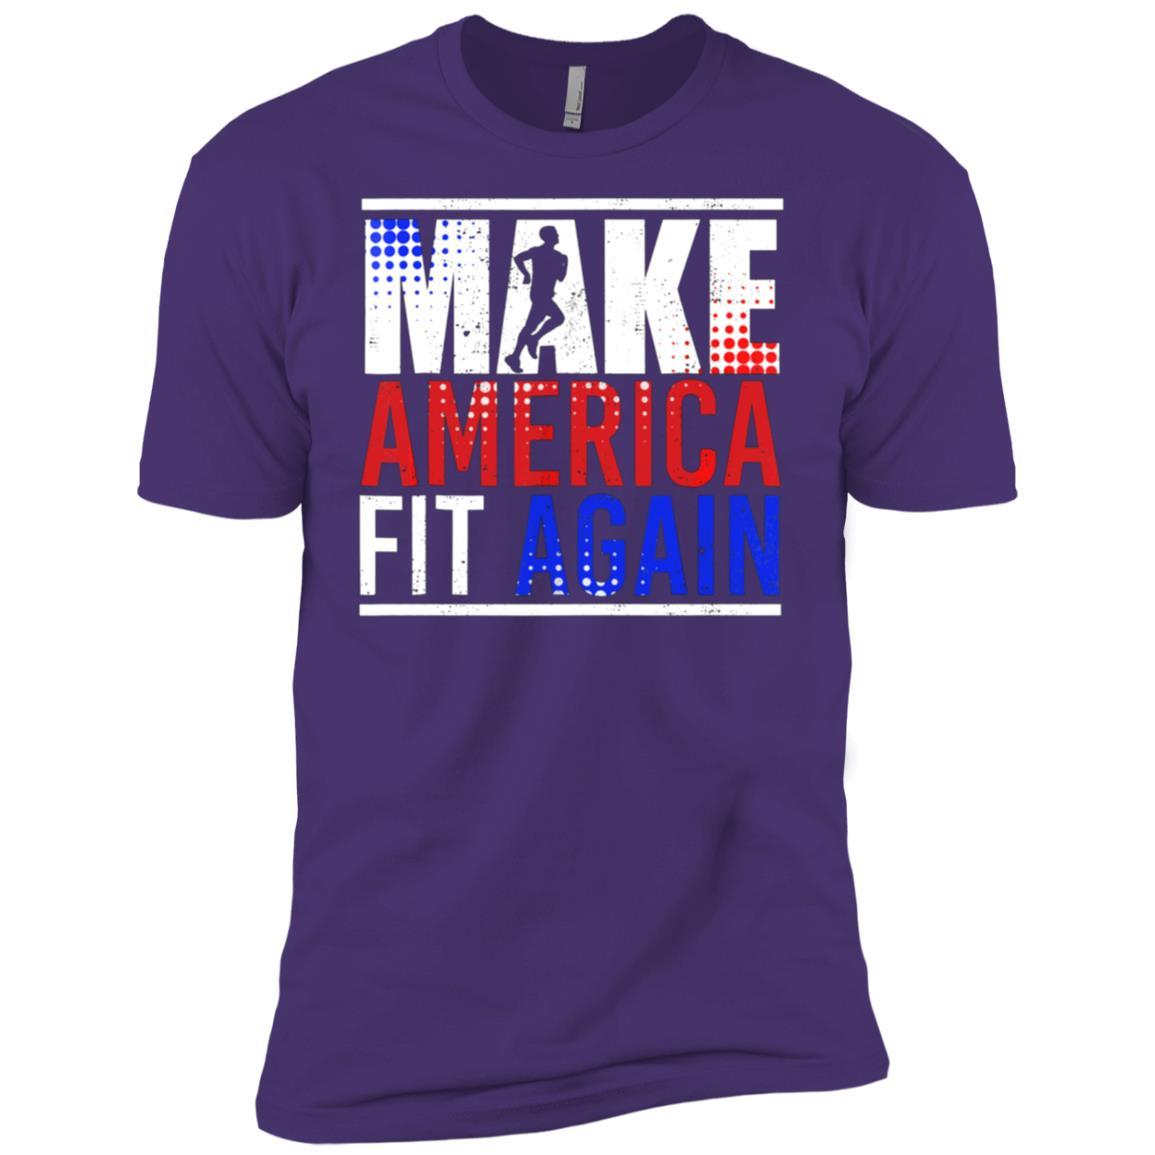 Make America Fit Again Funny Fitness Exercise Tee Men Short Sleeve T-Shirt